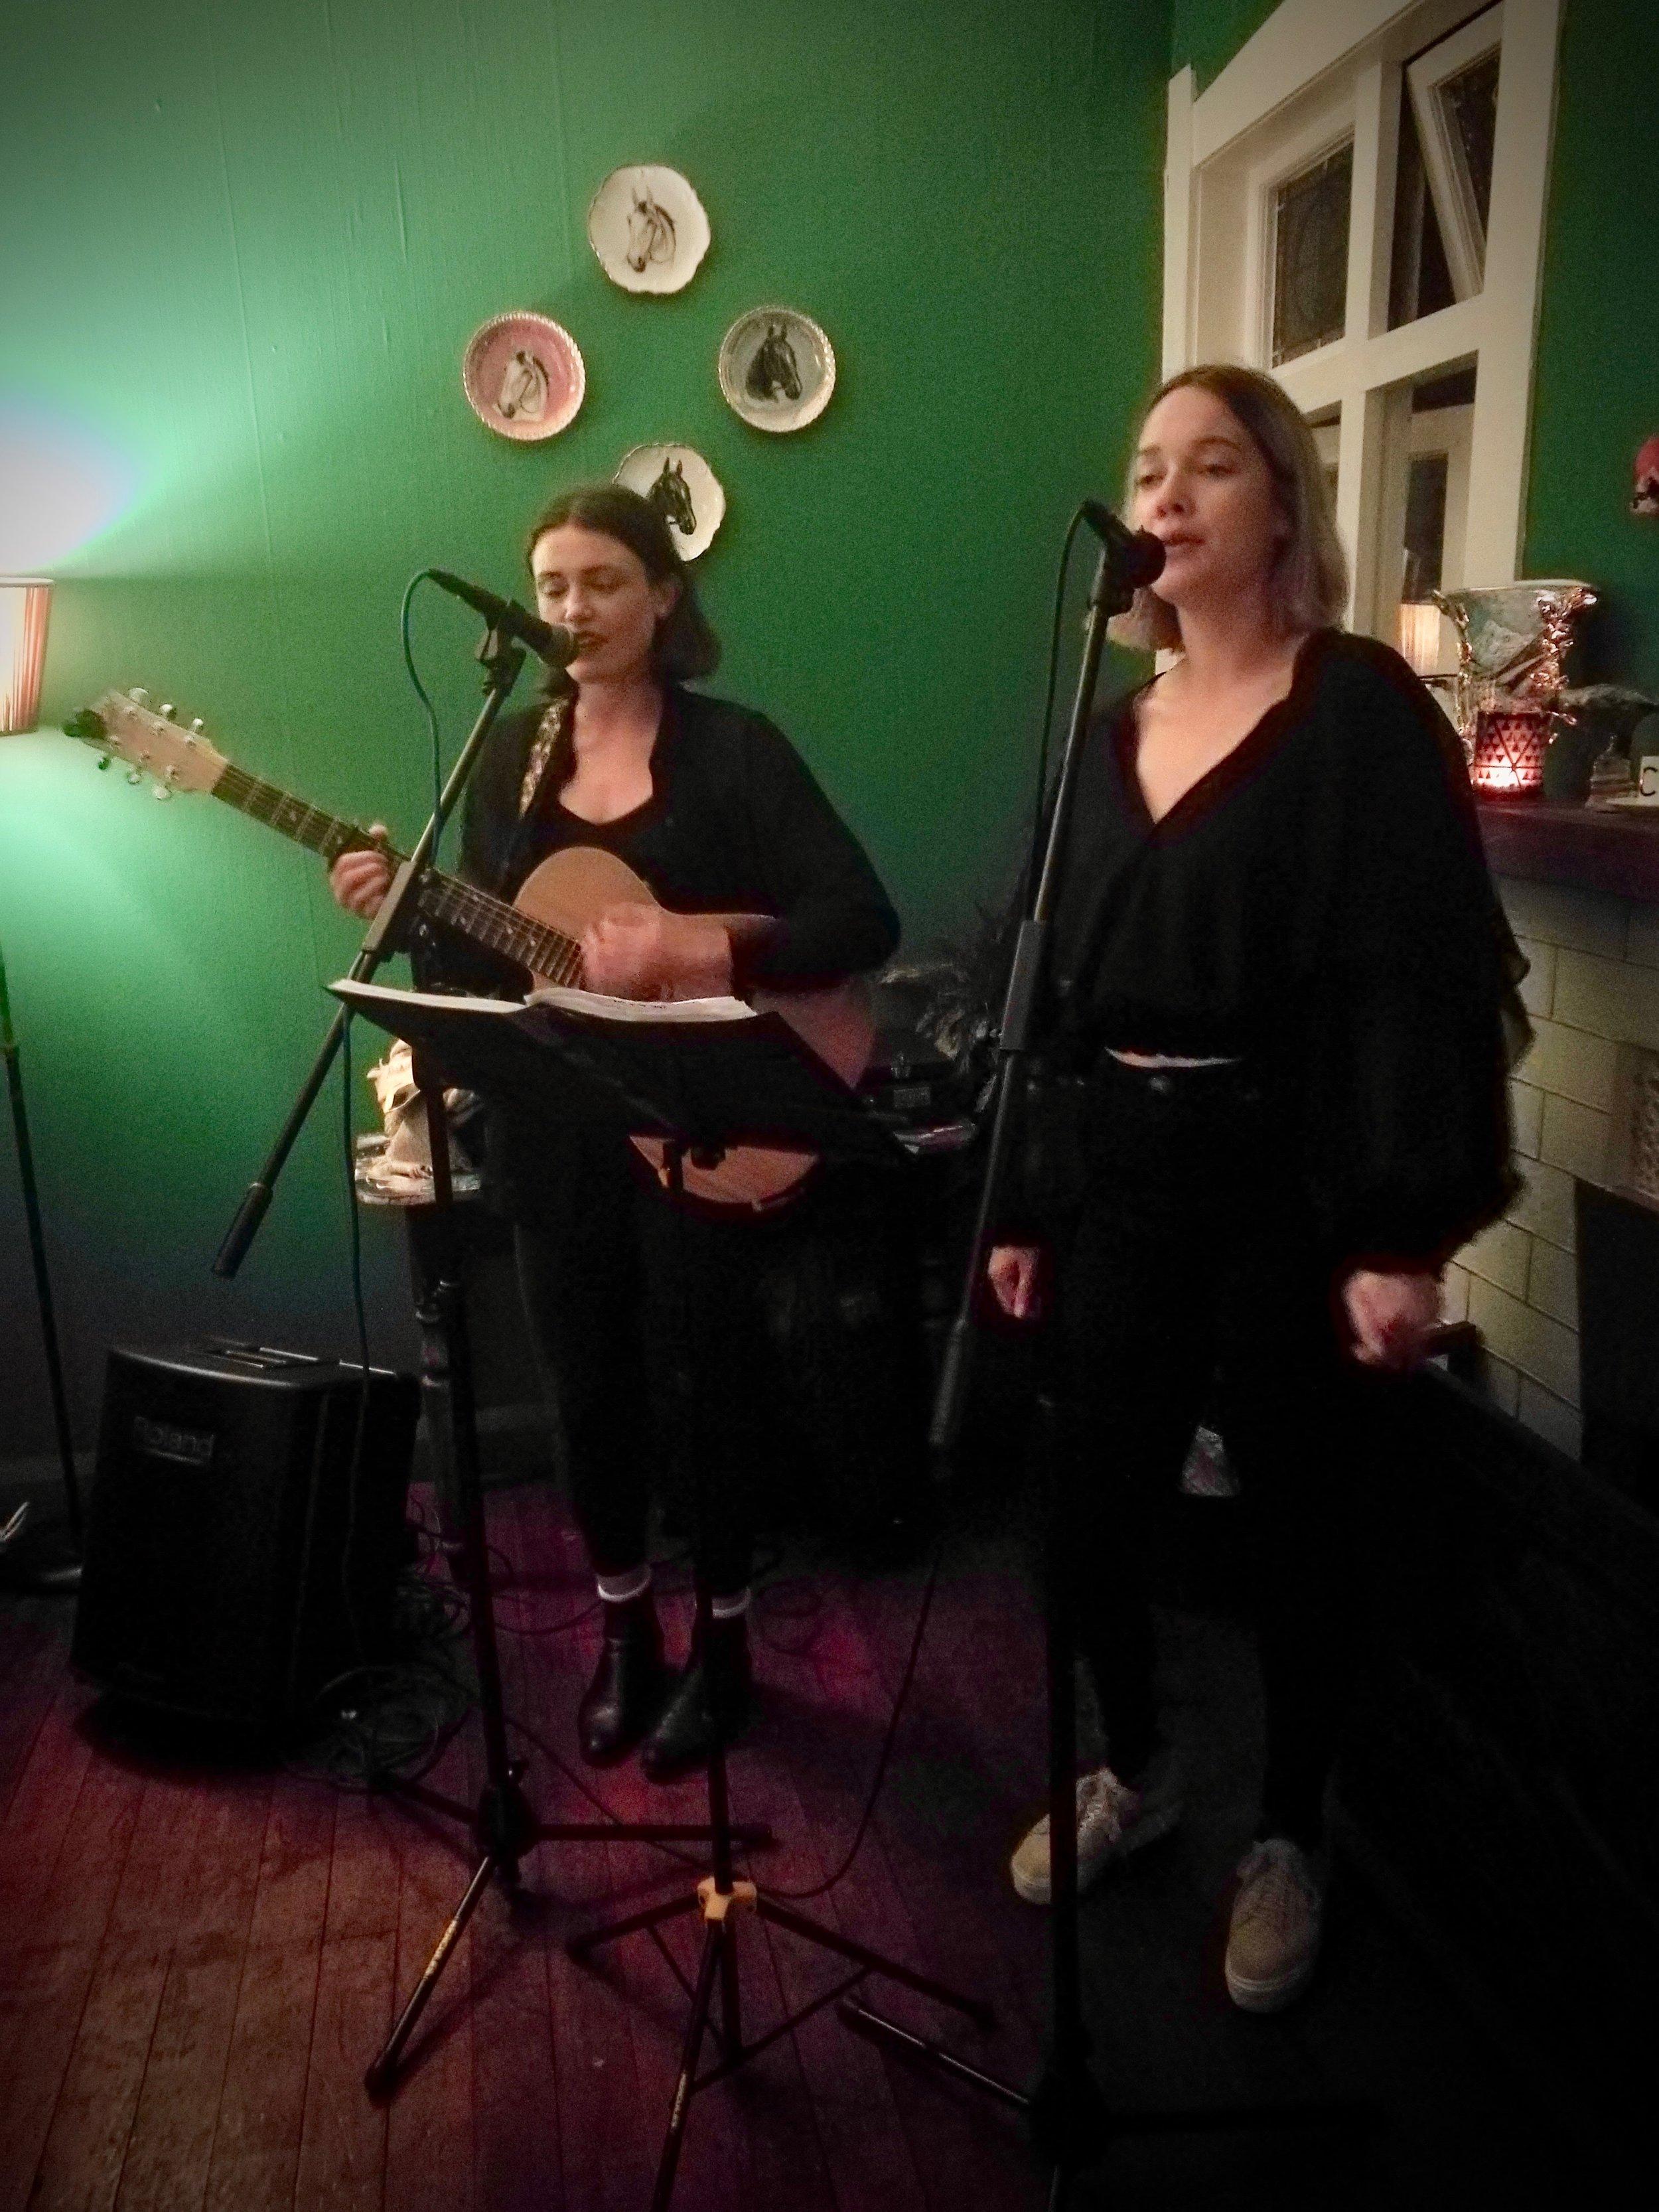 ROOK - Hanna Judd & Rose Treadwell